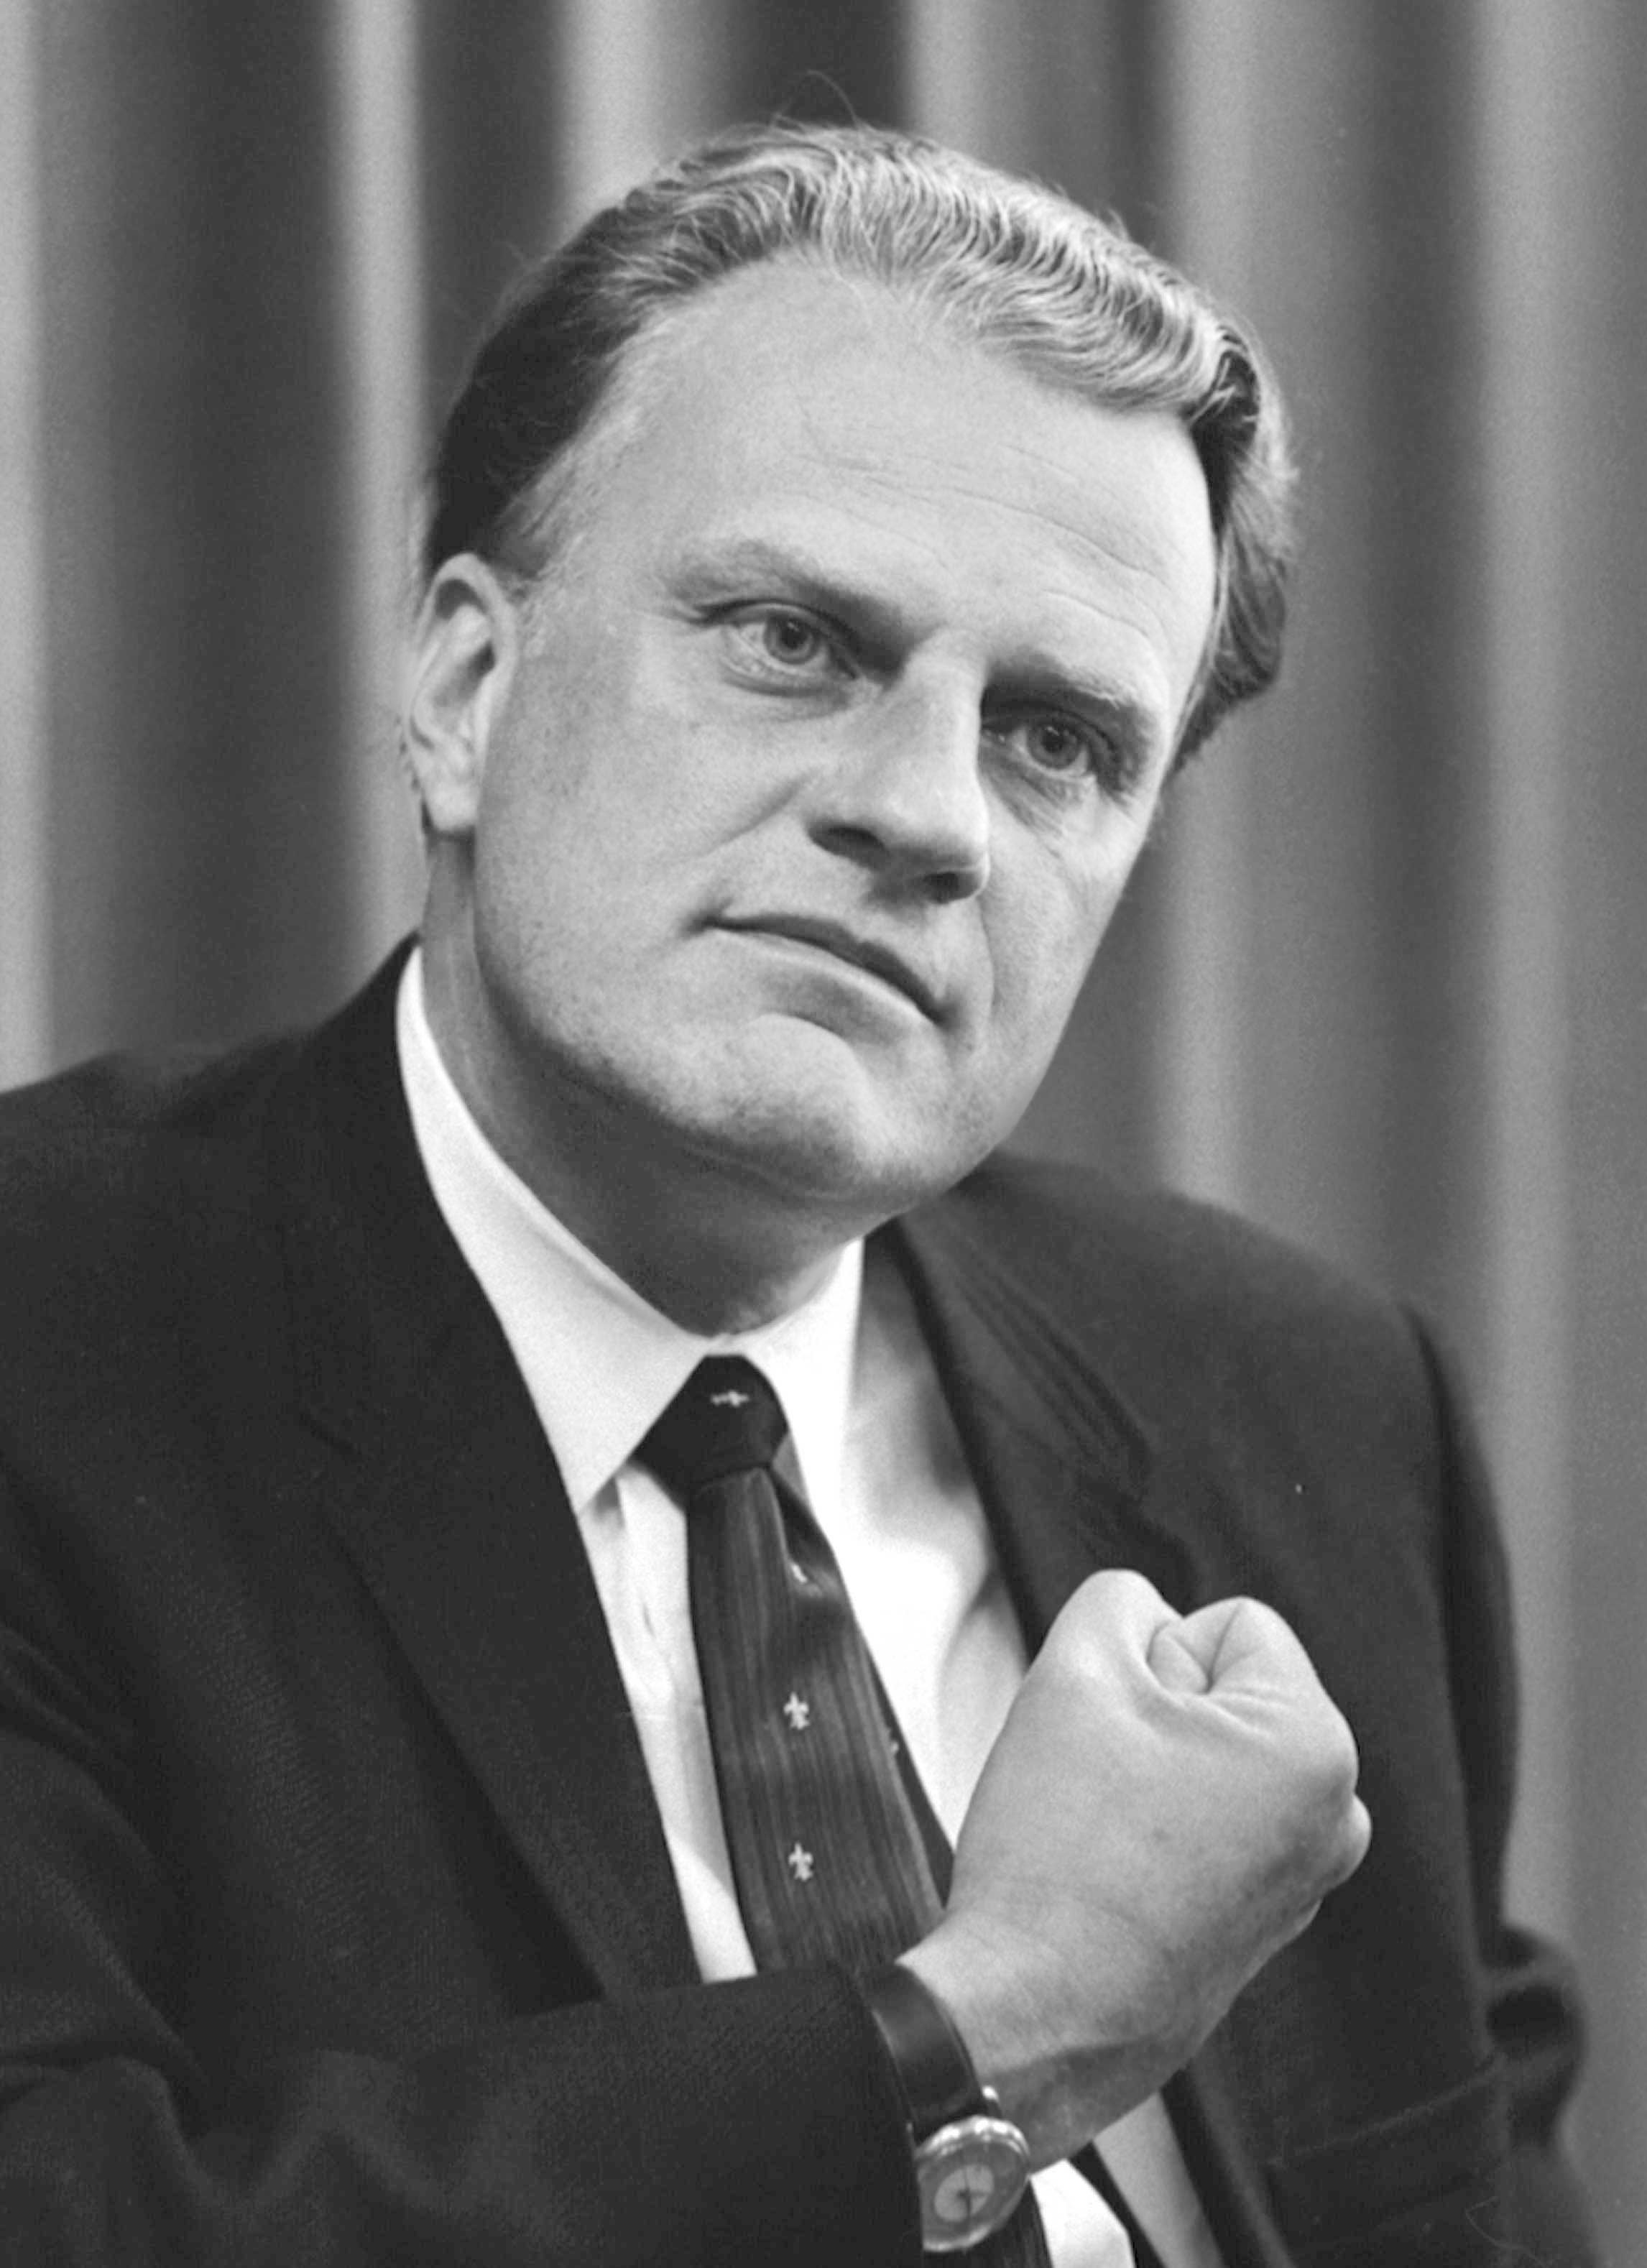 File:Billy Graham bw photo, April 11, 1966.jpg - Wikimedia ...